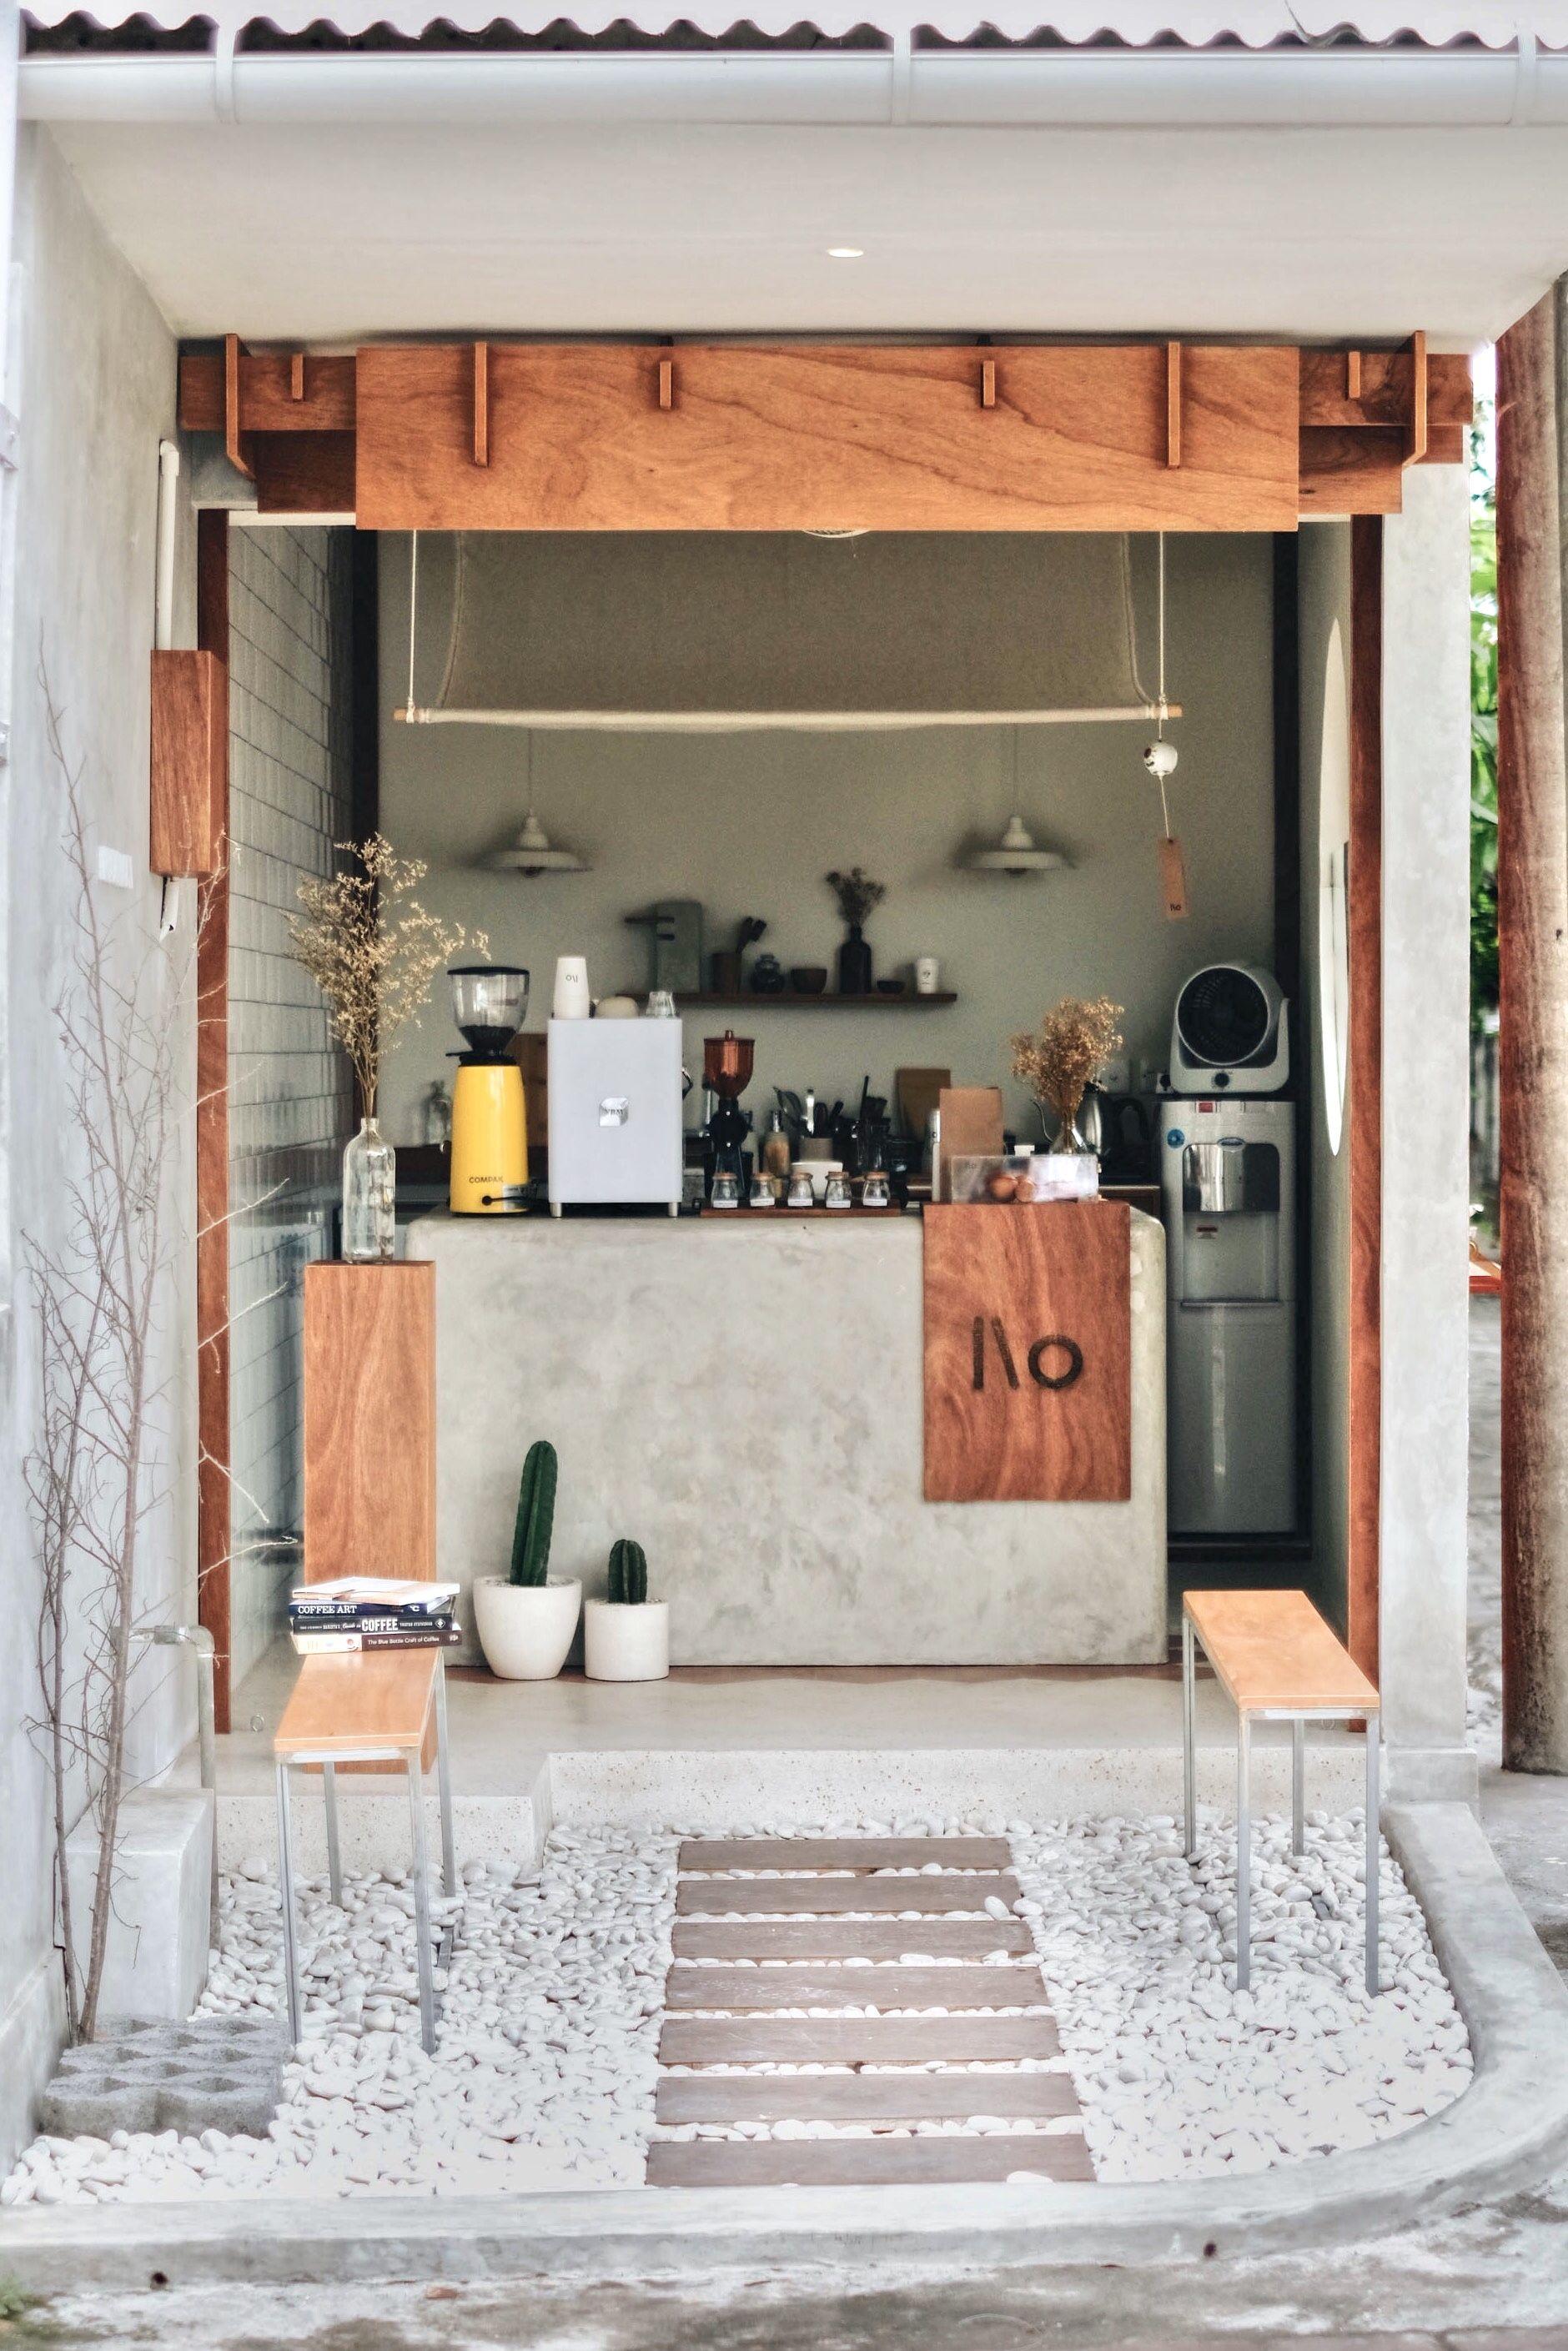 Https Www Instagram Com P By601wol1ms Dream In A Dream Korean Coffee Shop Coffee Shop Aesthetic Cozy Cafe